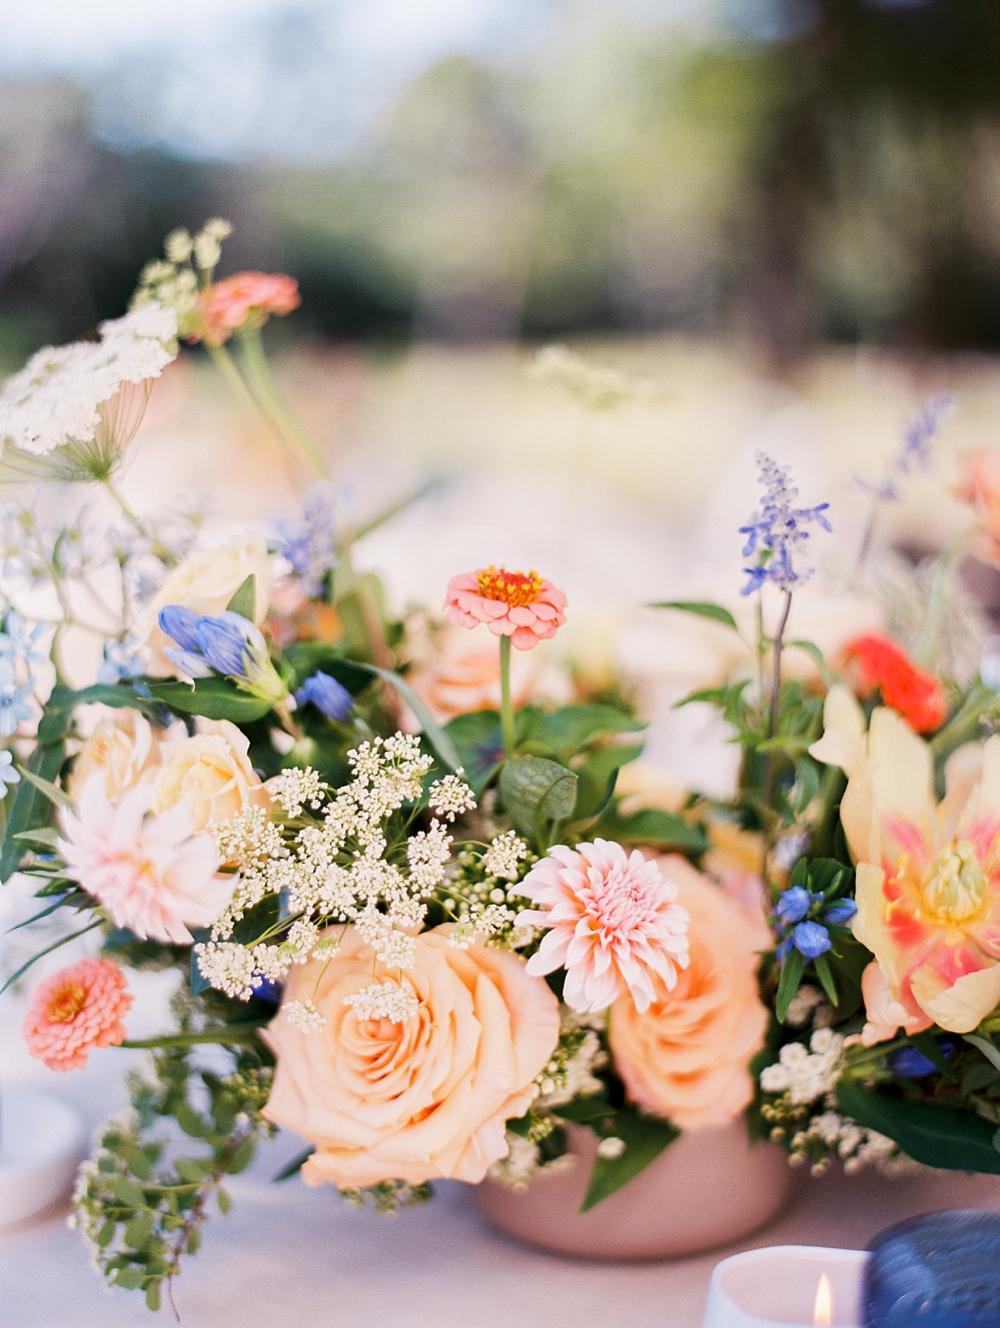 Kristin-La-Voie-Photography-Austin-Wedding-Photographer-the-grand-lady-26